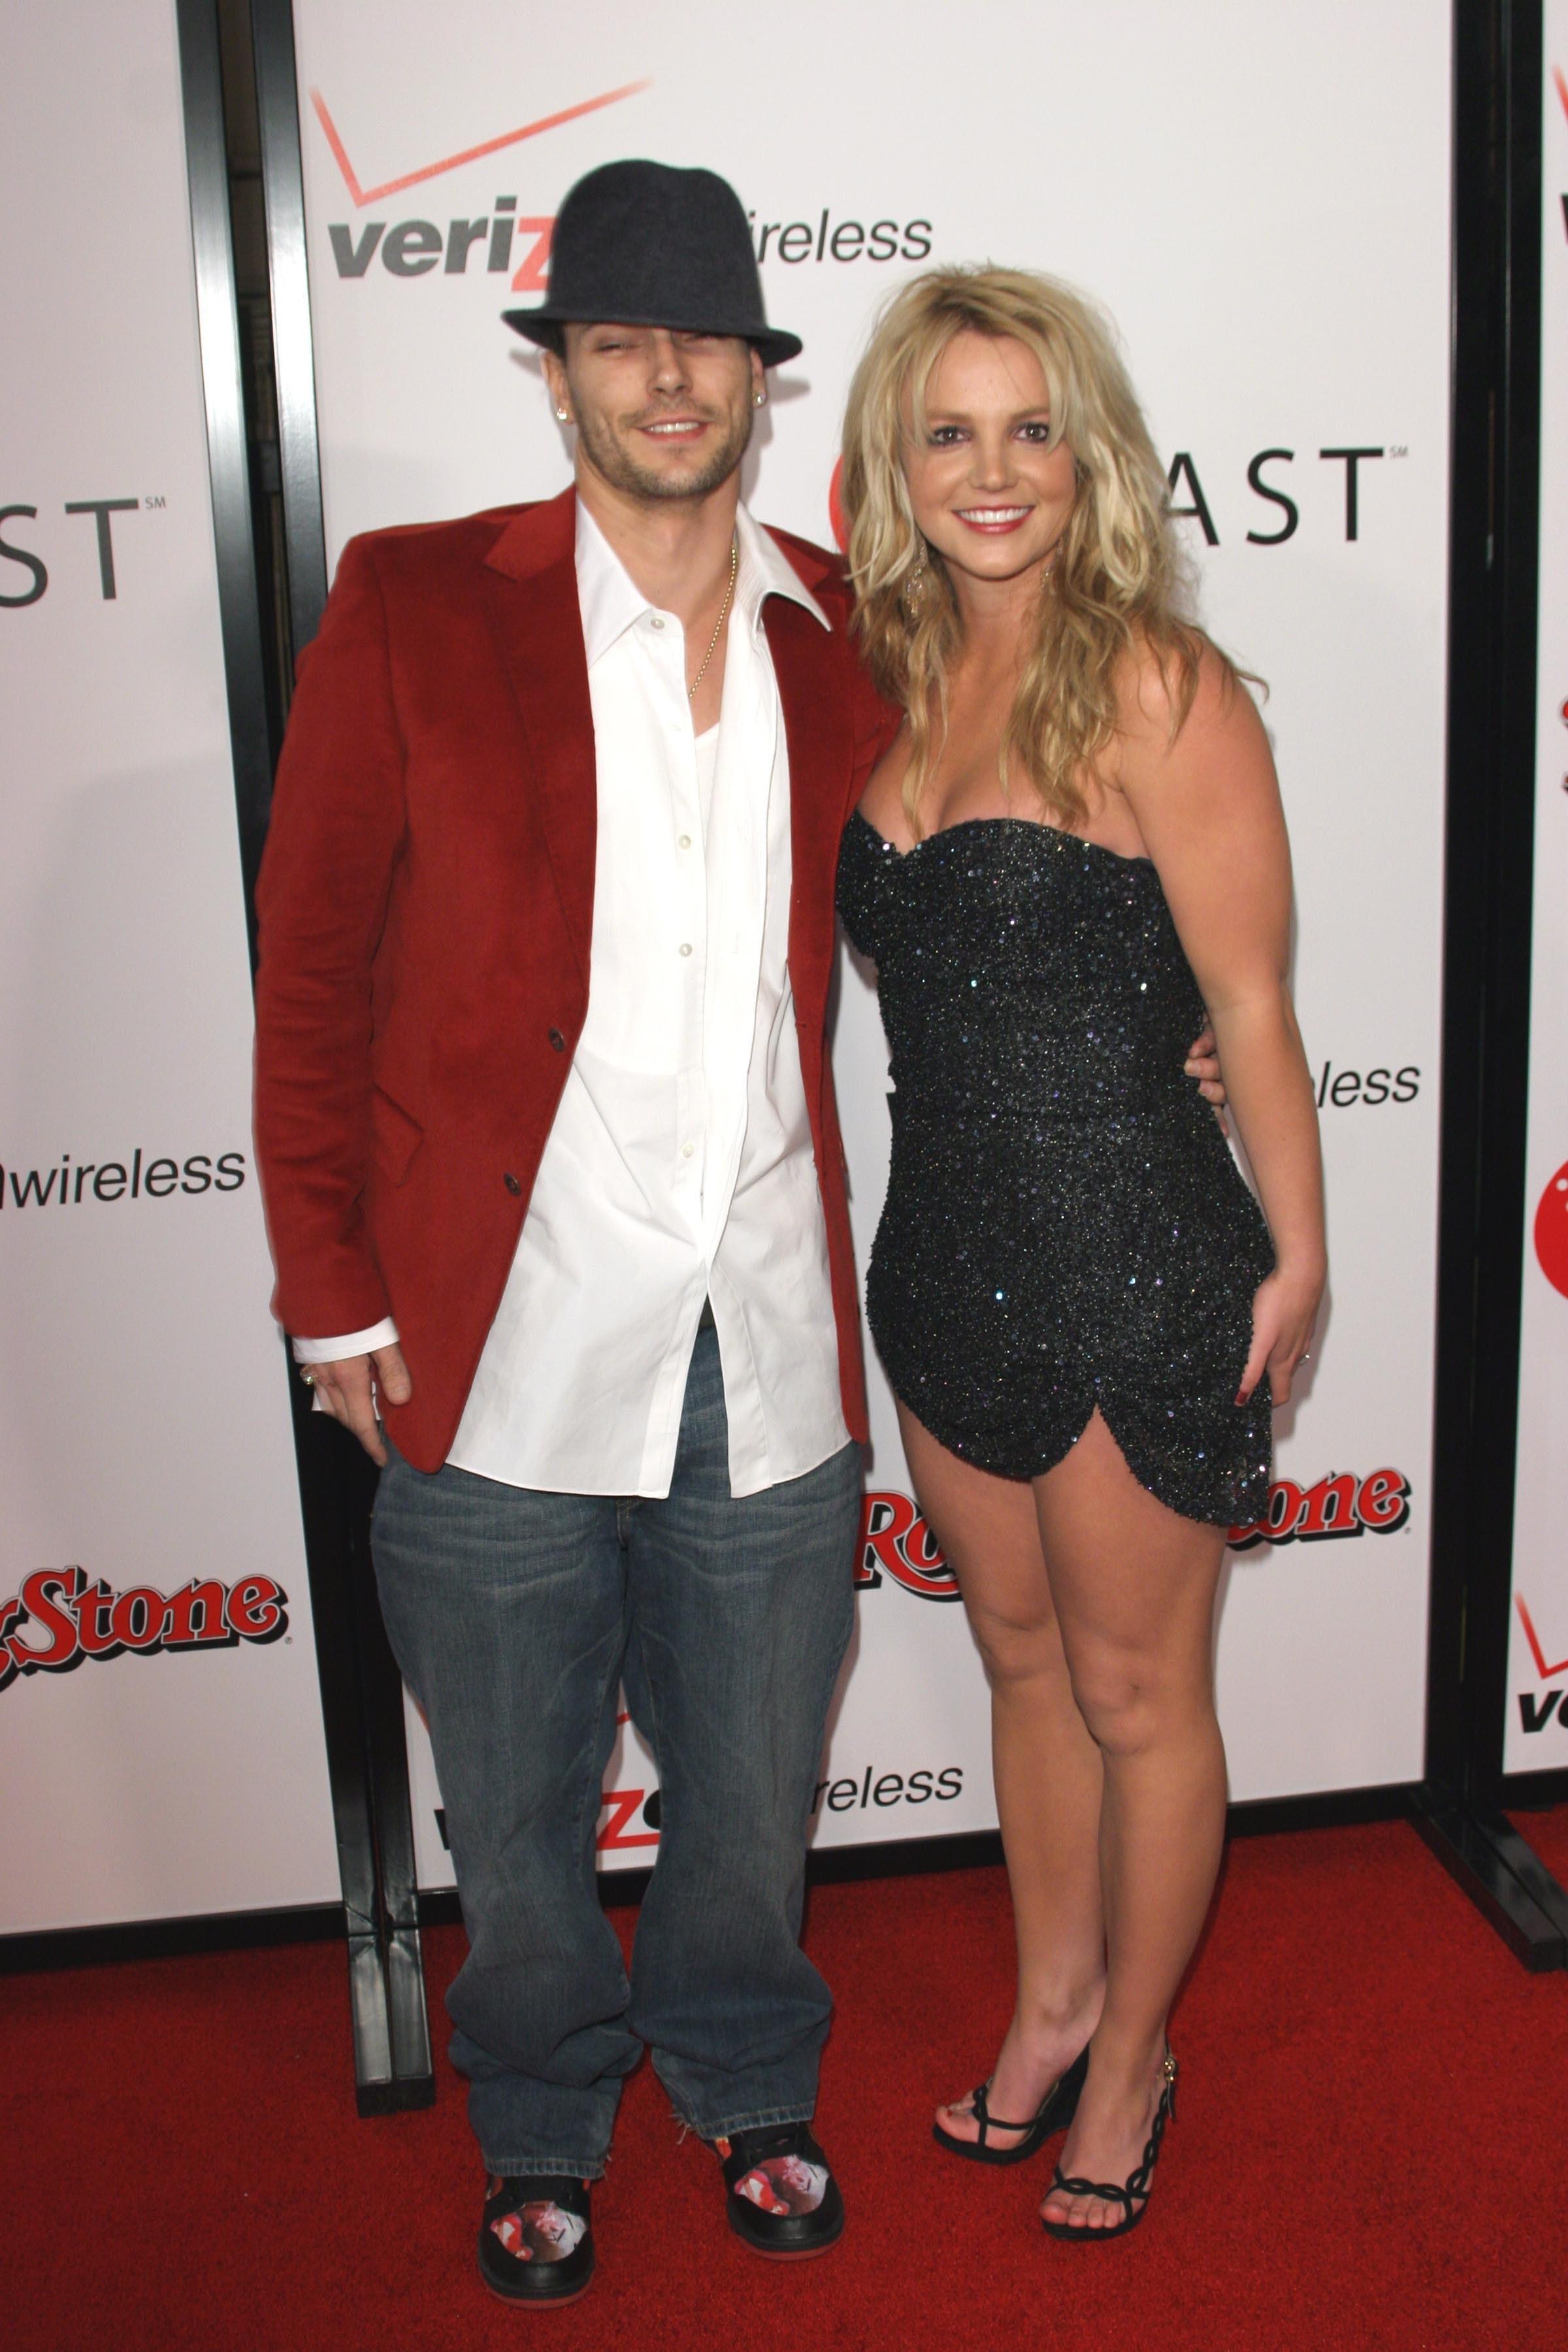 Kevin Federline and Britney Spears on the red carpet together